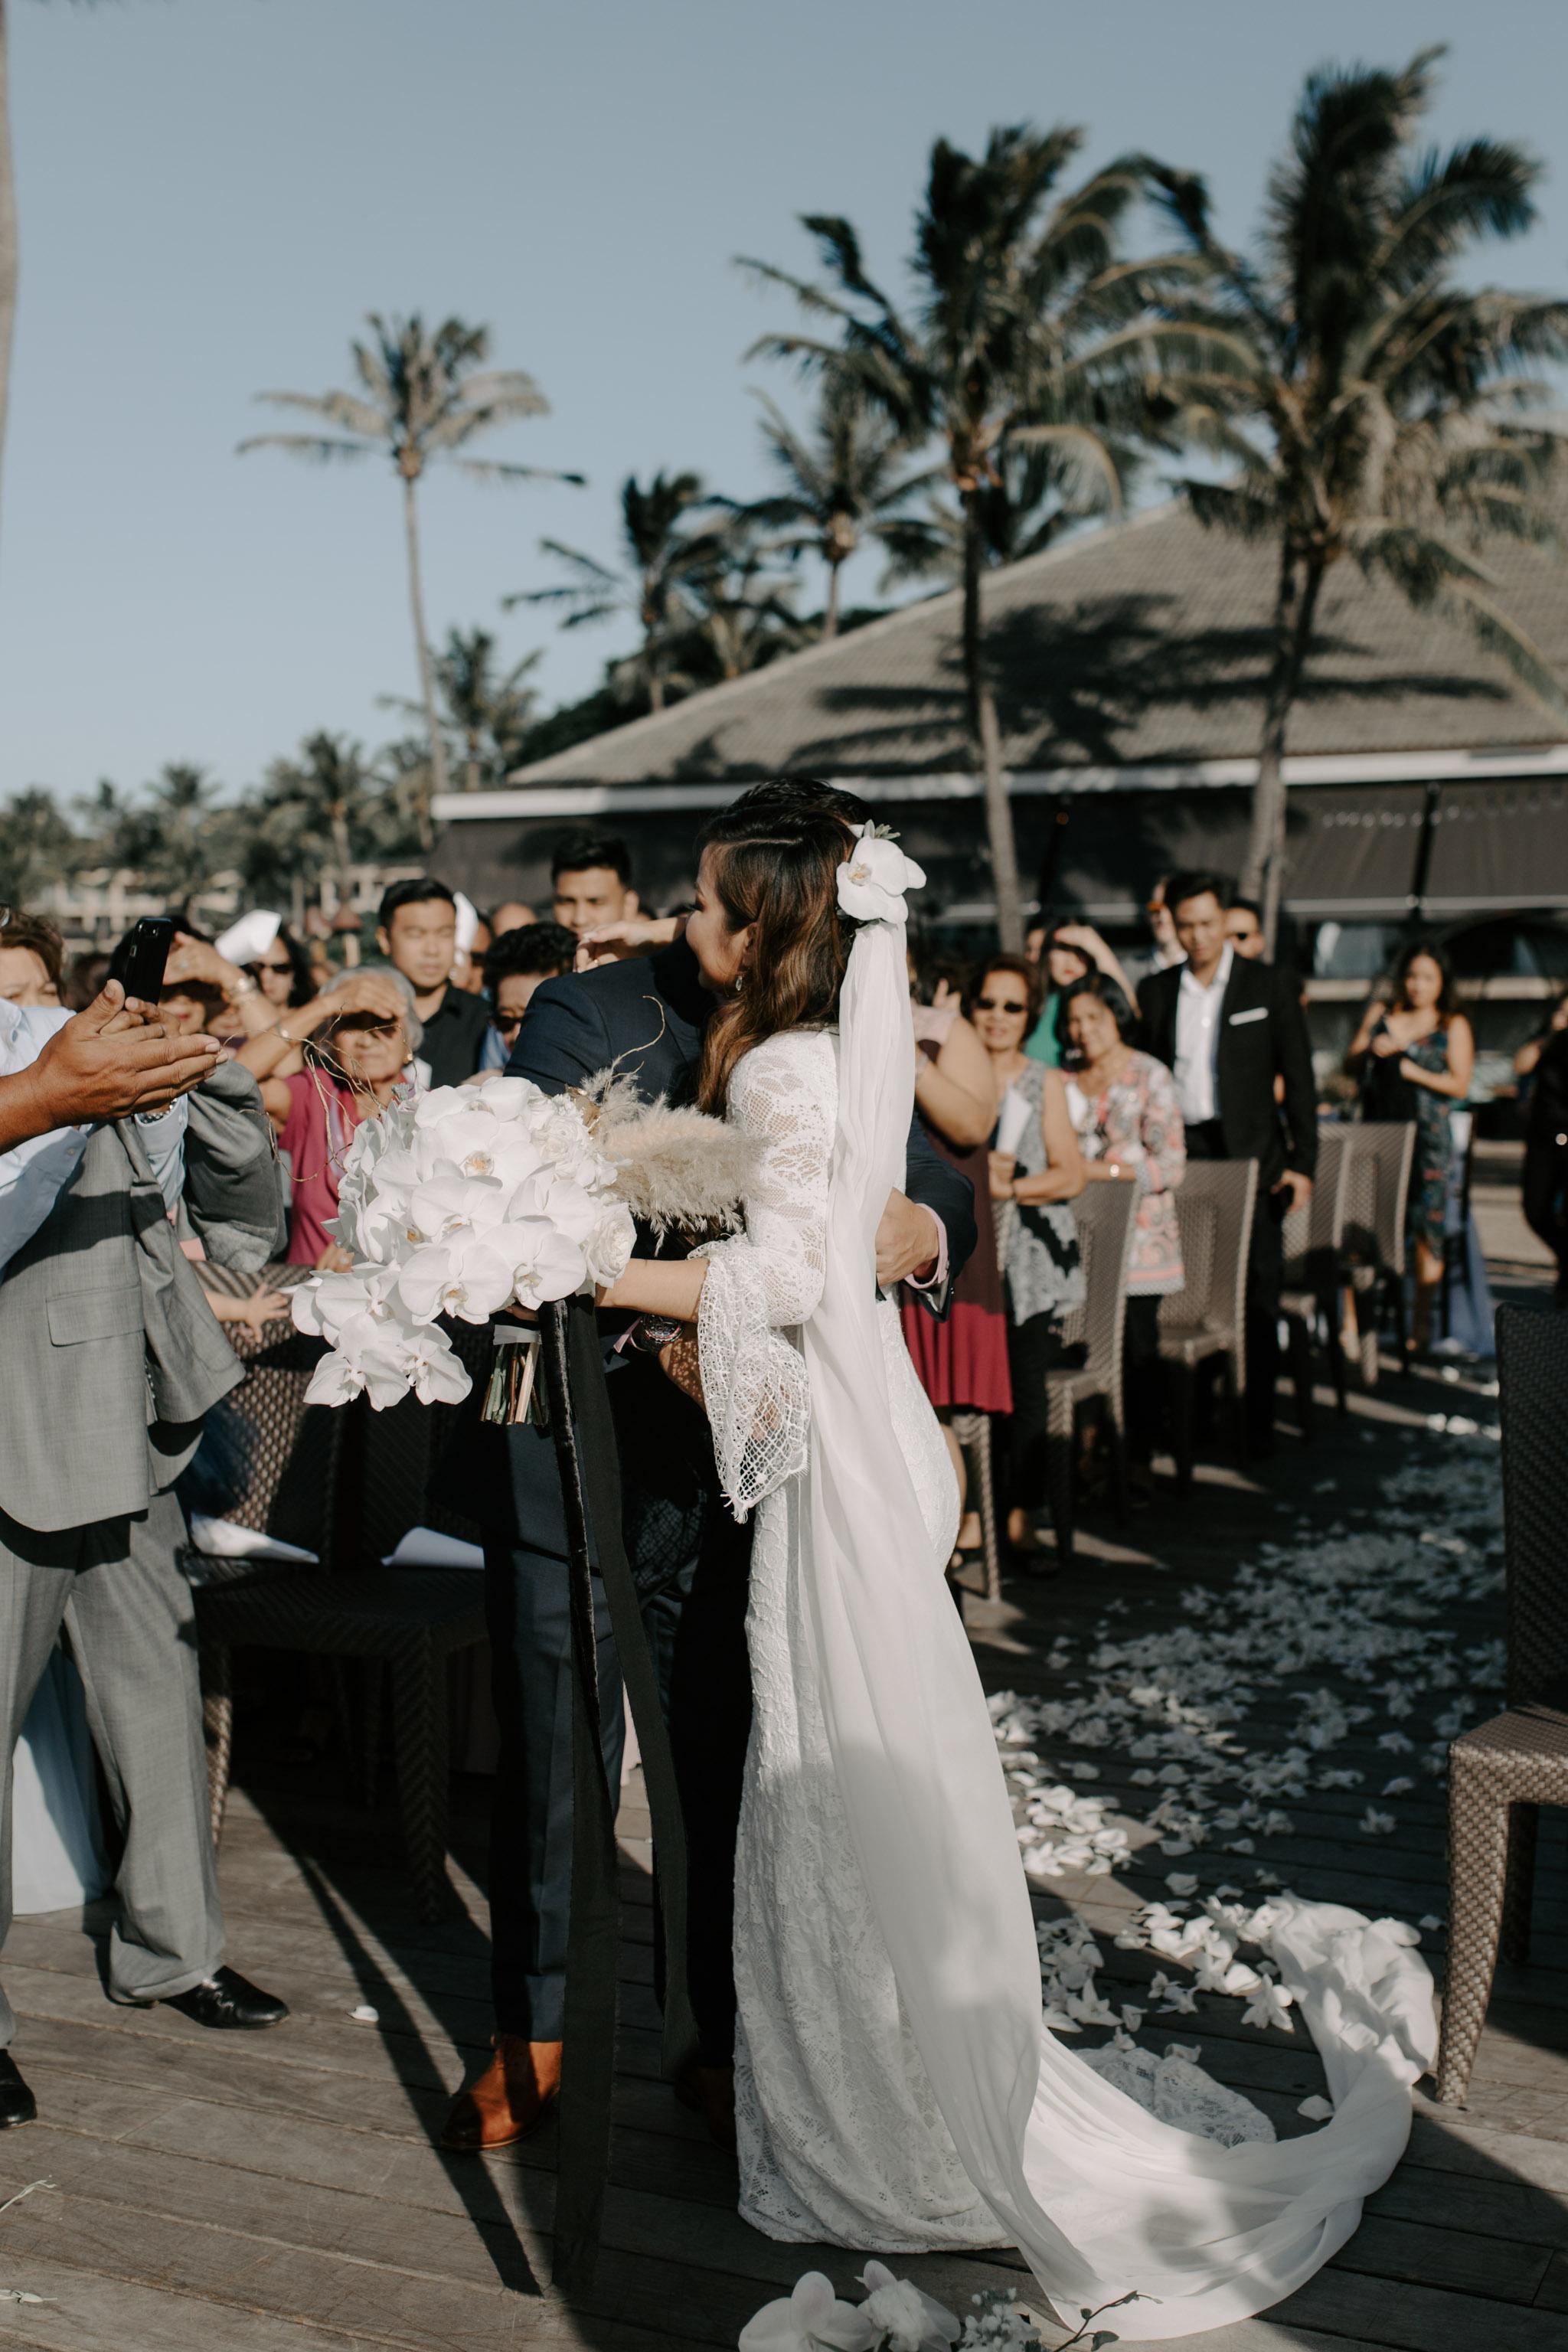 Father of the bride giving her away   Merriman's Kapalua Maui wedding by Hawaii wedding photographer Desiree Leilani